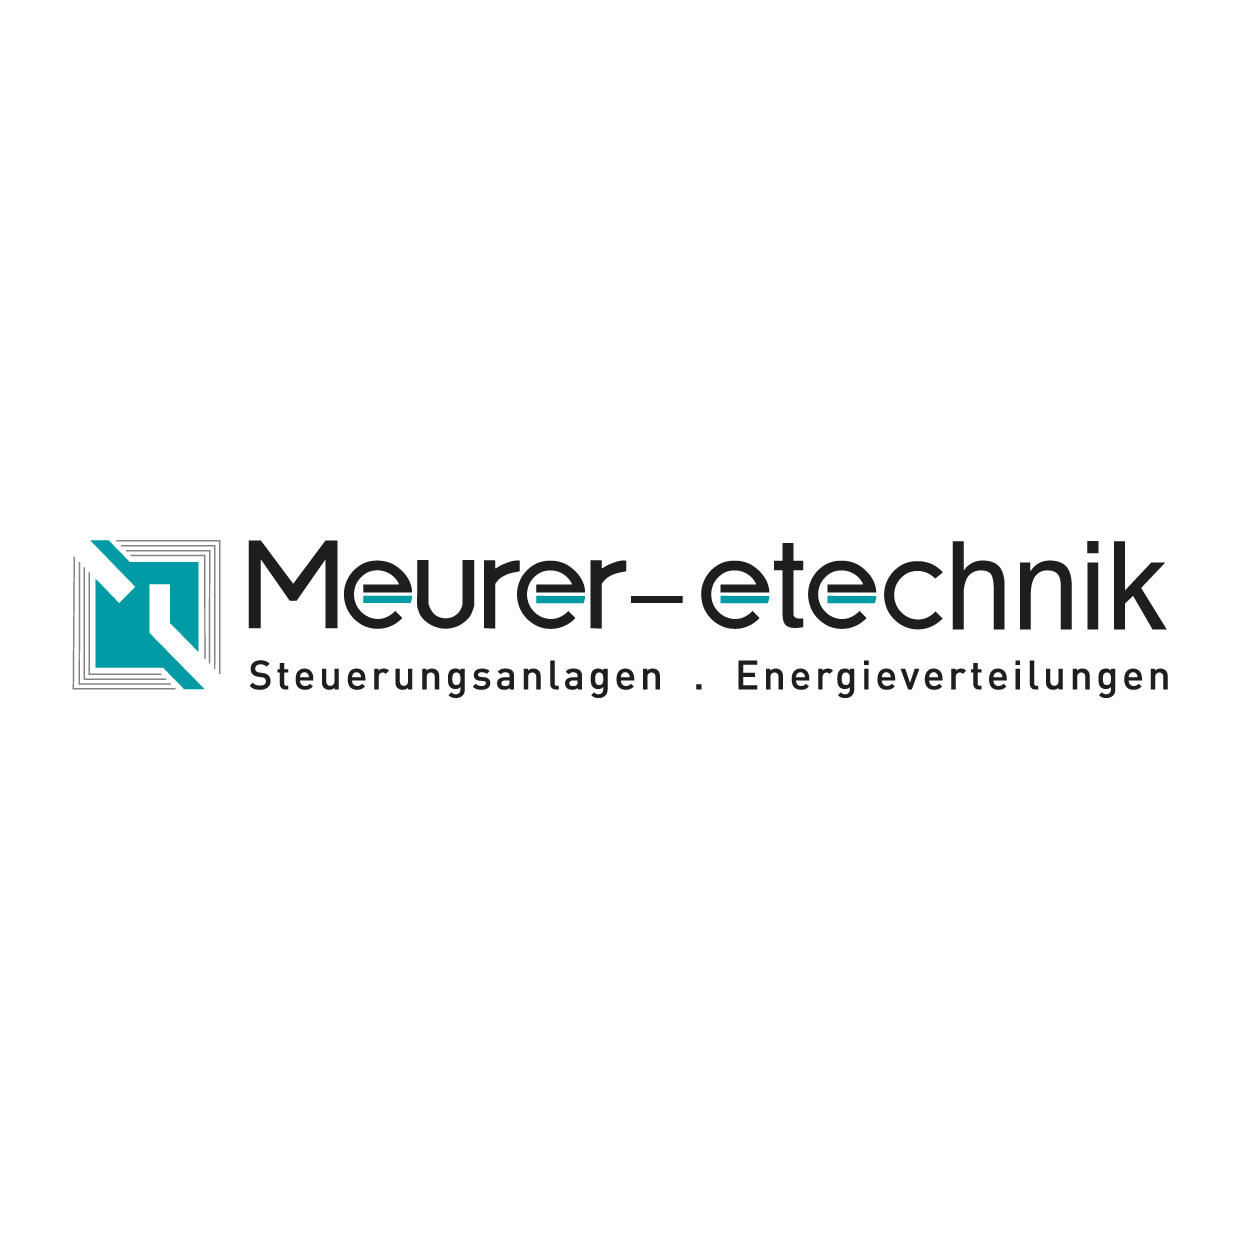 Logo_MeurerEtechnik_Zeichenfläche 1.jpg